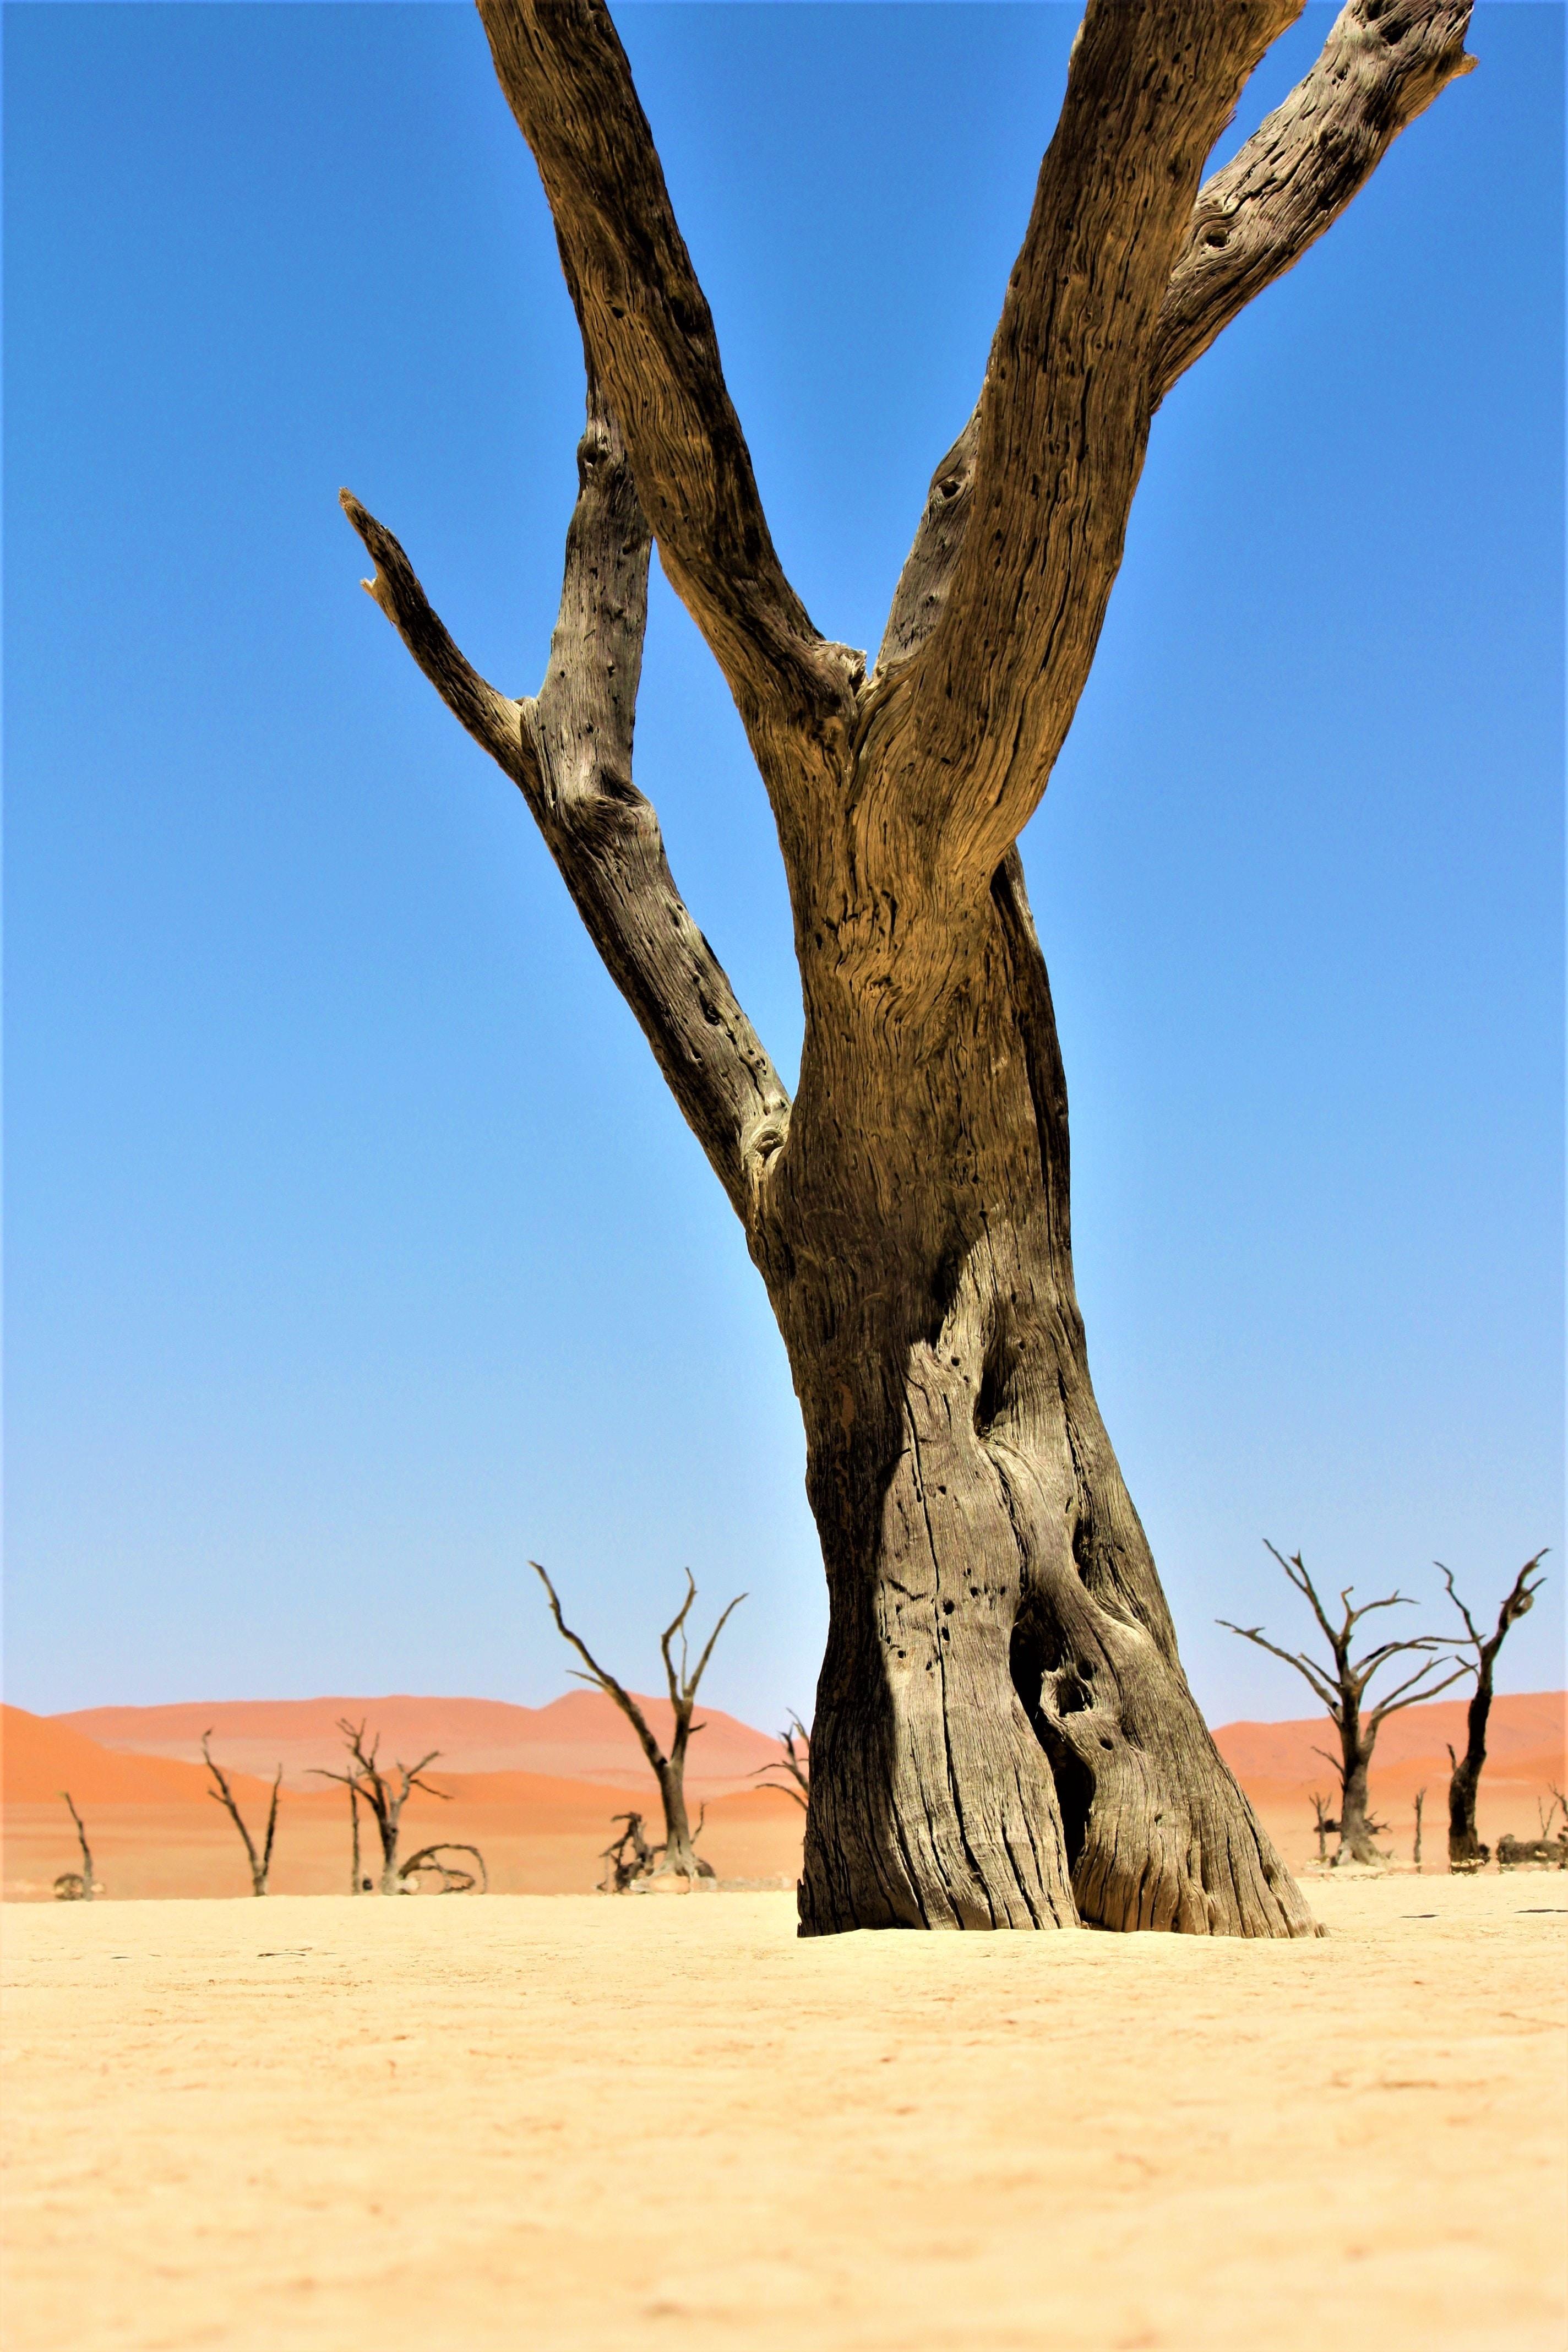 brown bare tree on desert during daytime